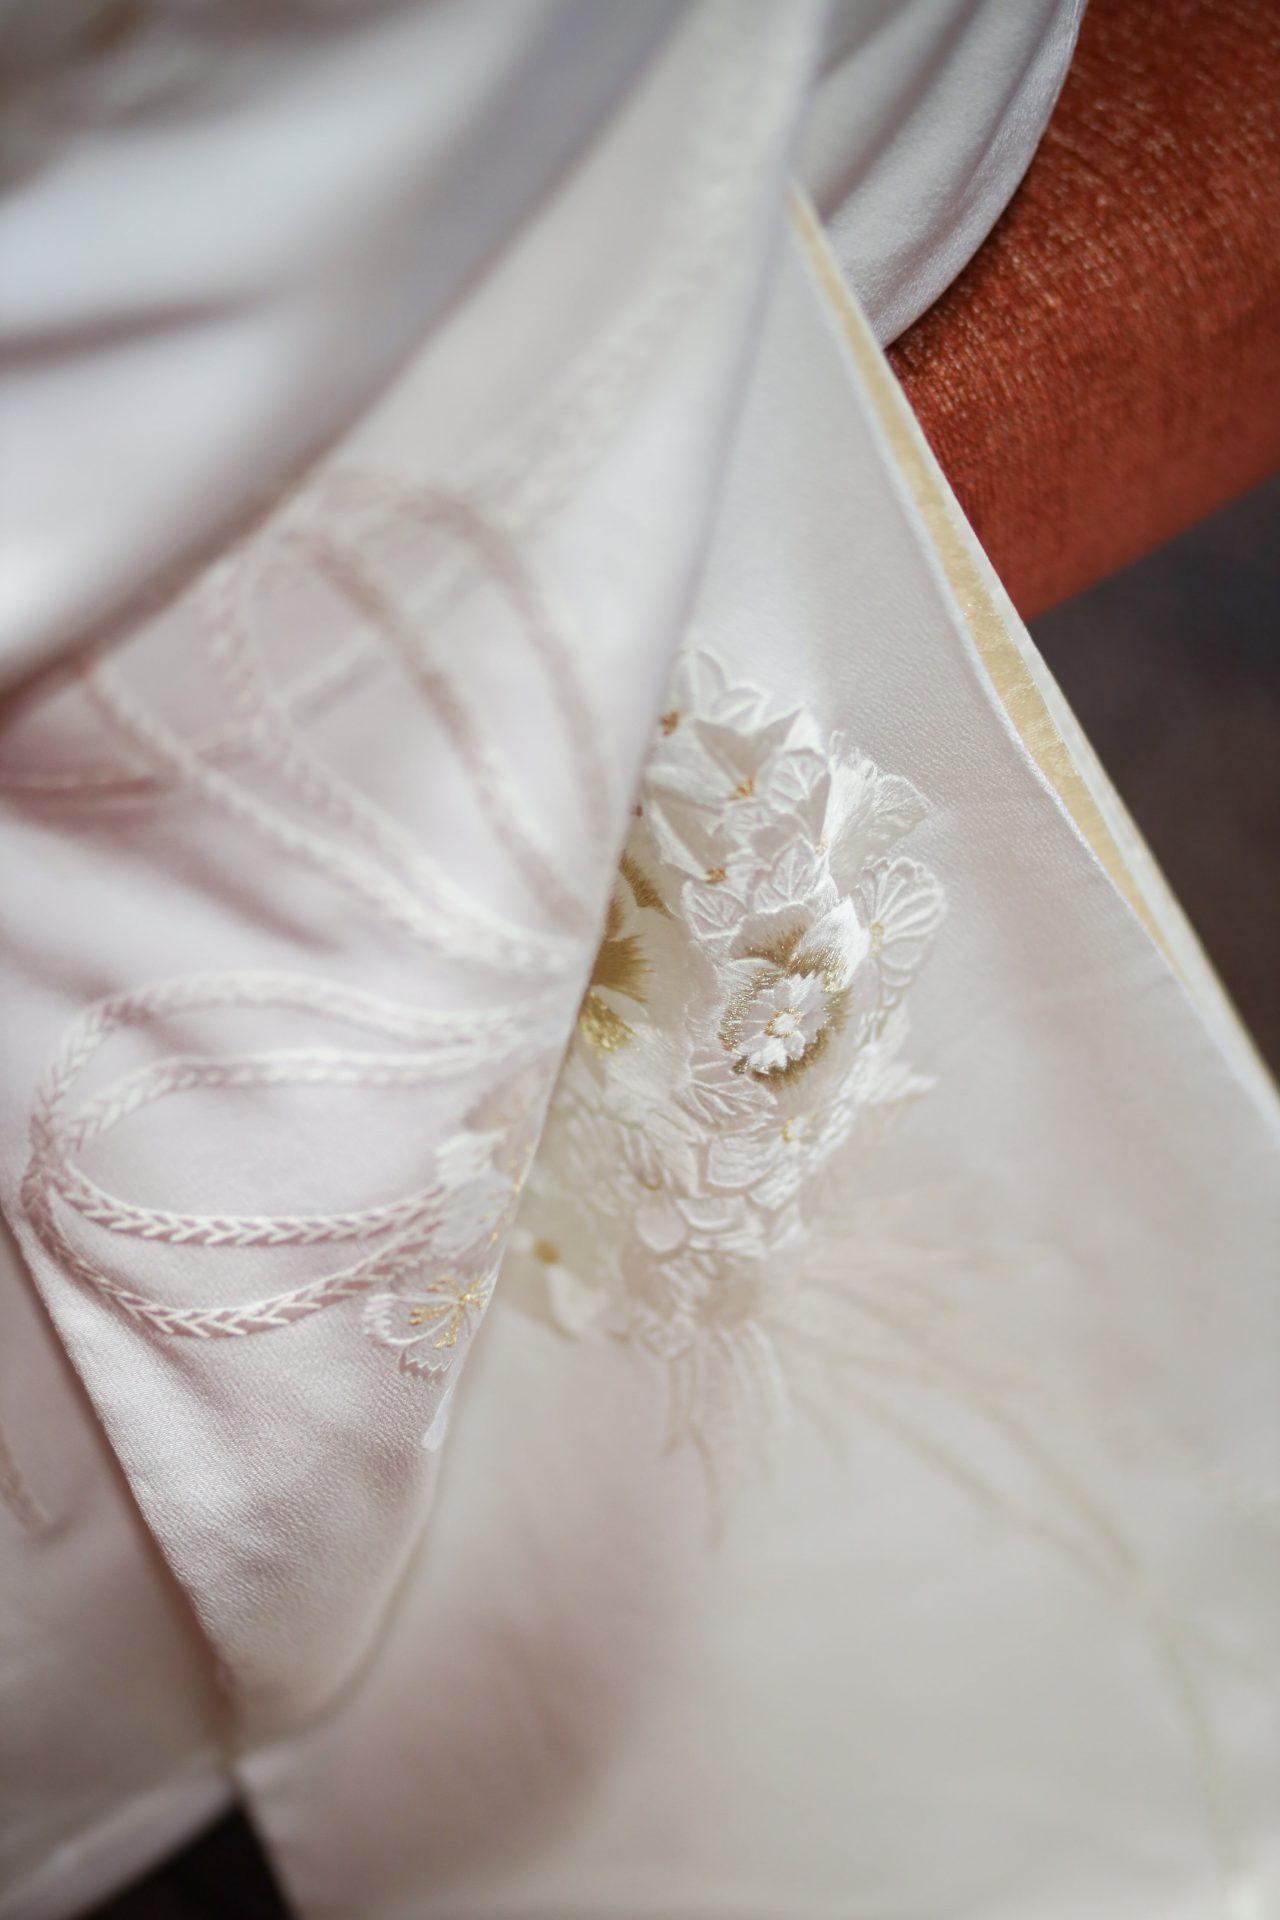 THE FUNATSUYAにてお式をされる花嫁様におすすめの金刺繍の白無垢